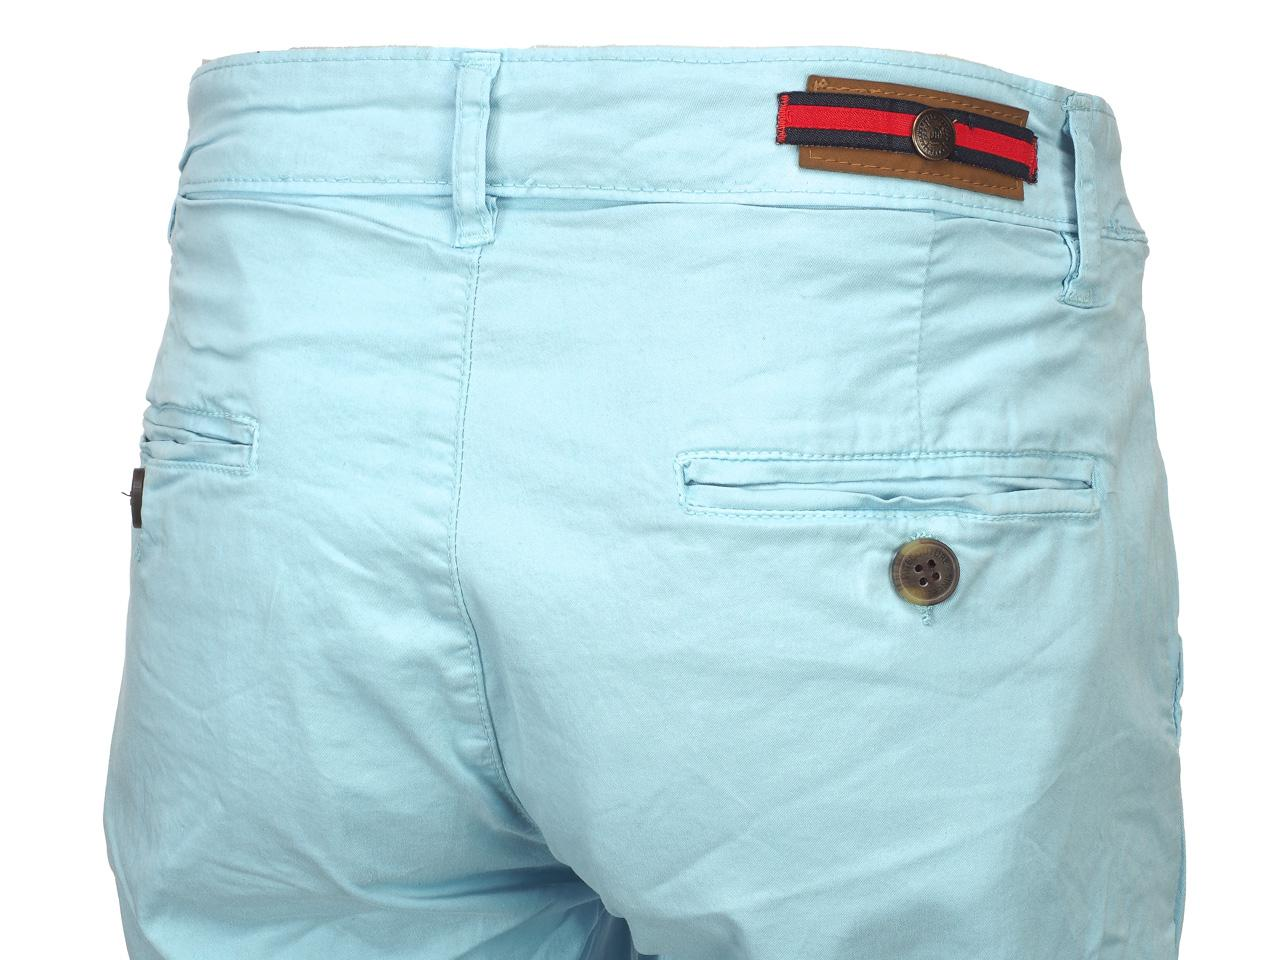 Bermuda-Shorts-Hite-Couture-Vobier-Sky-Bermuda-Chino-Blue-11597-New thumbnail 4